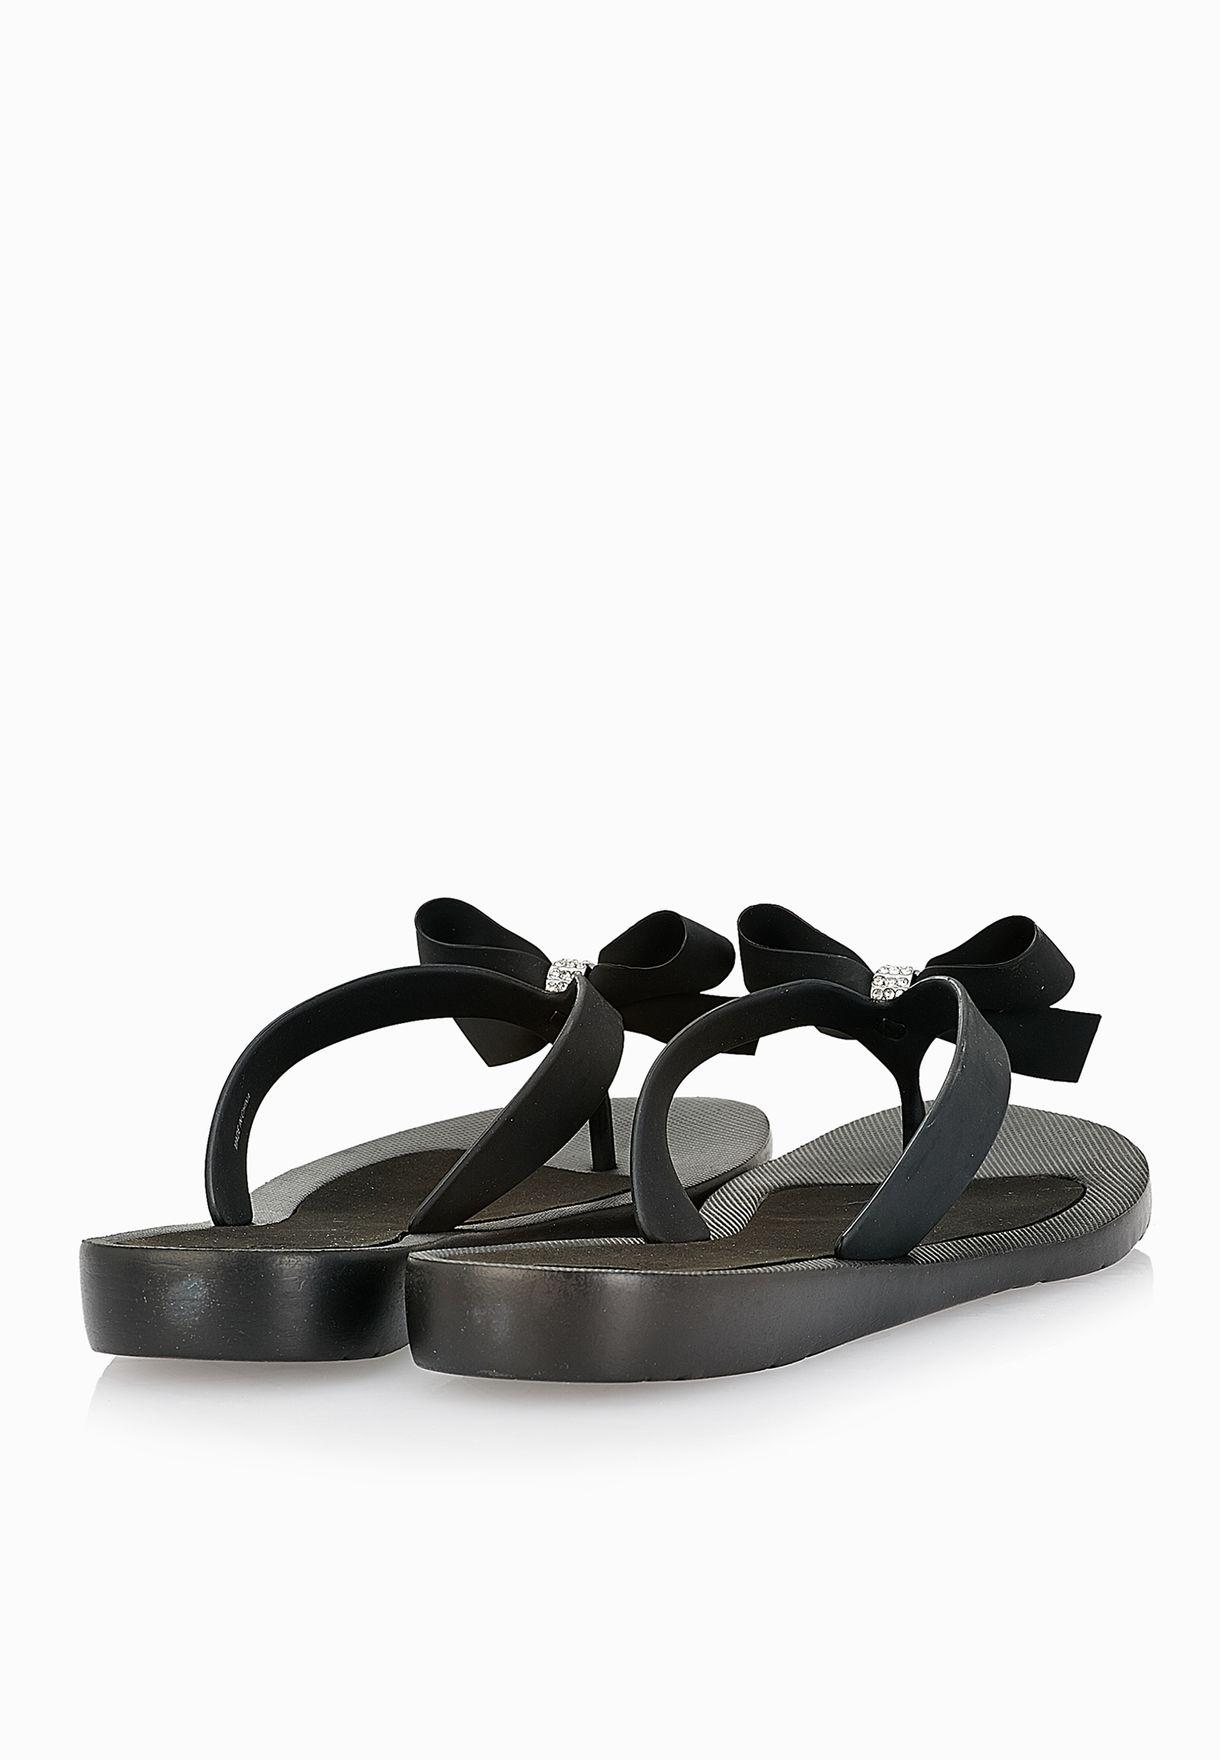 7cbf761460c1 Shop Guess black Bow Flip Flops D-TUTU-B for Women in Kuwait ...